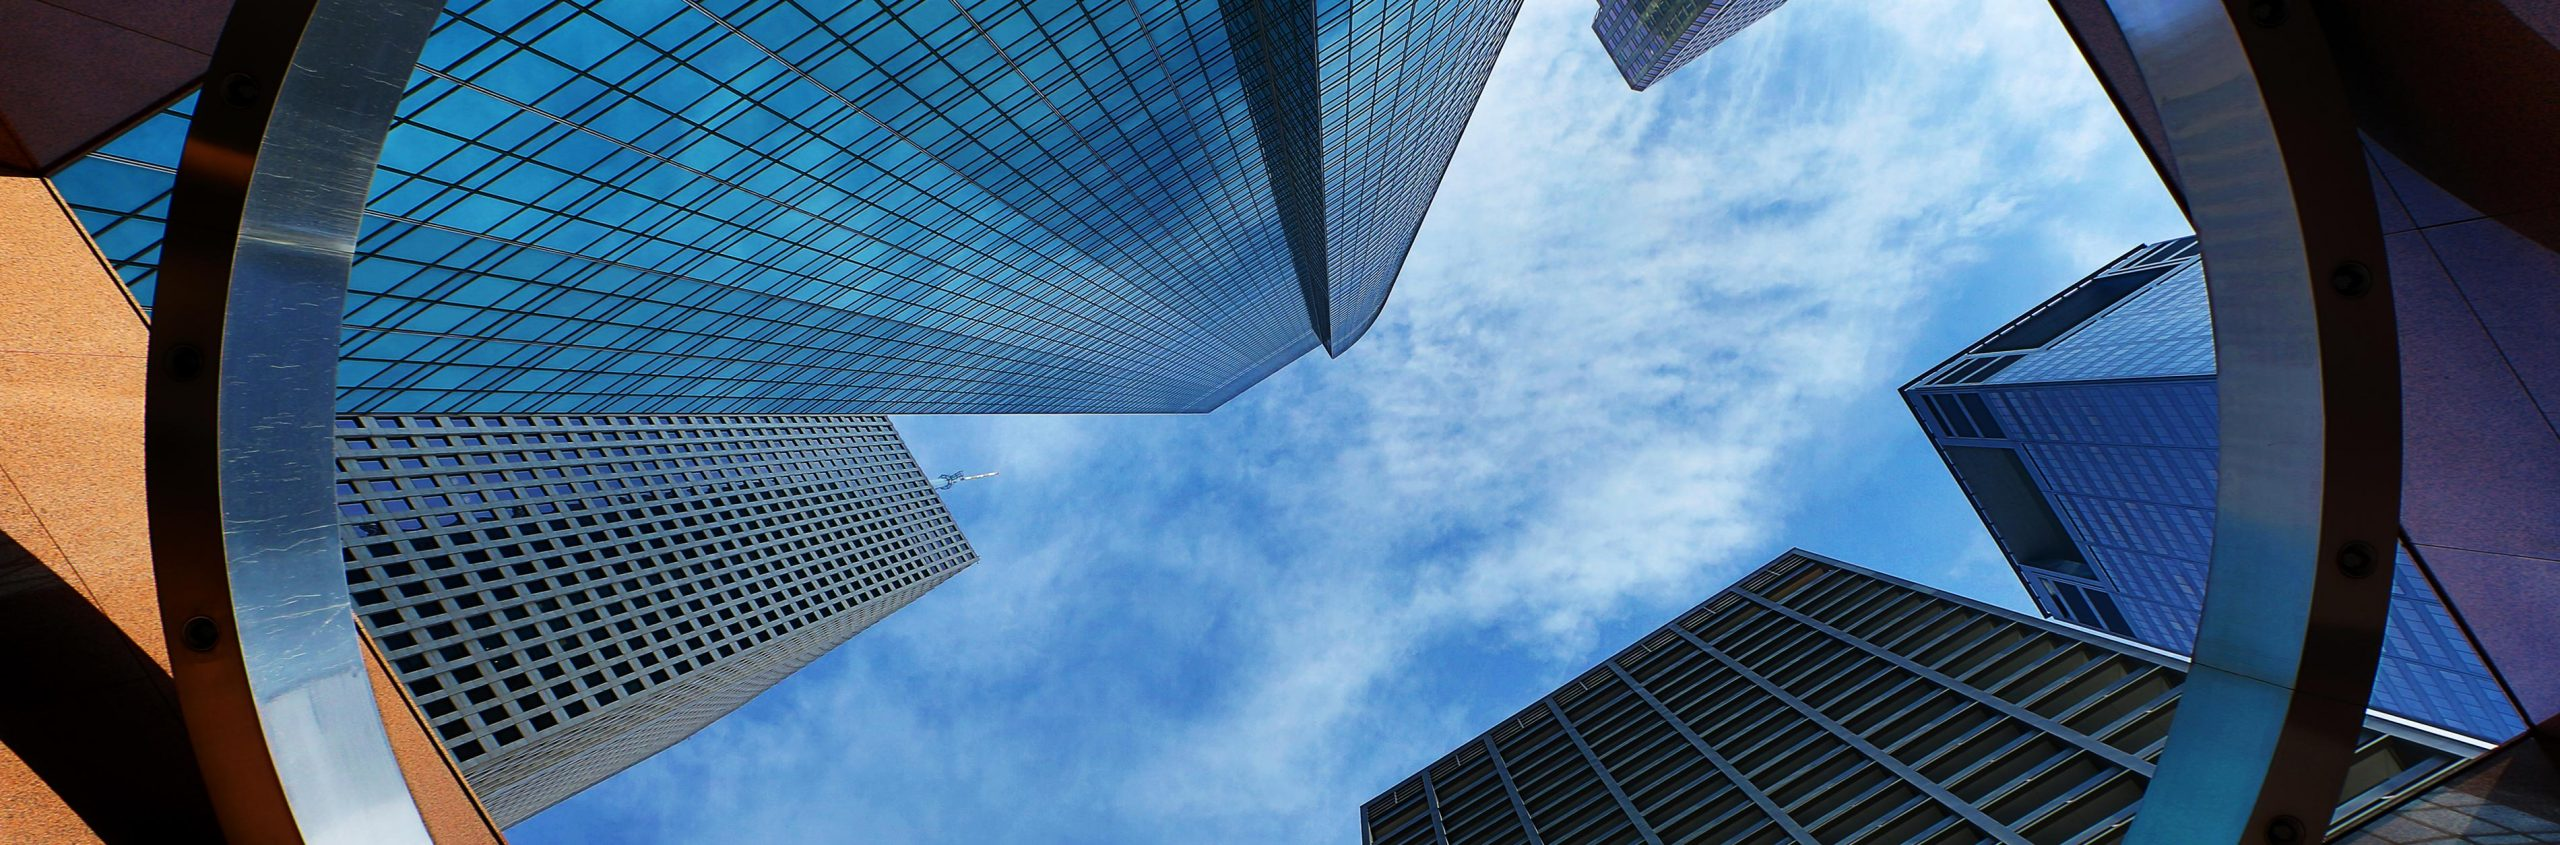 Rycore Capital Fund Management